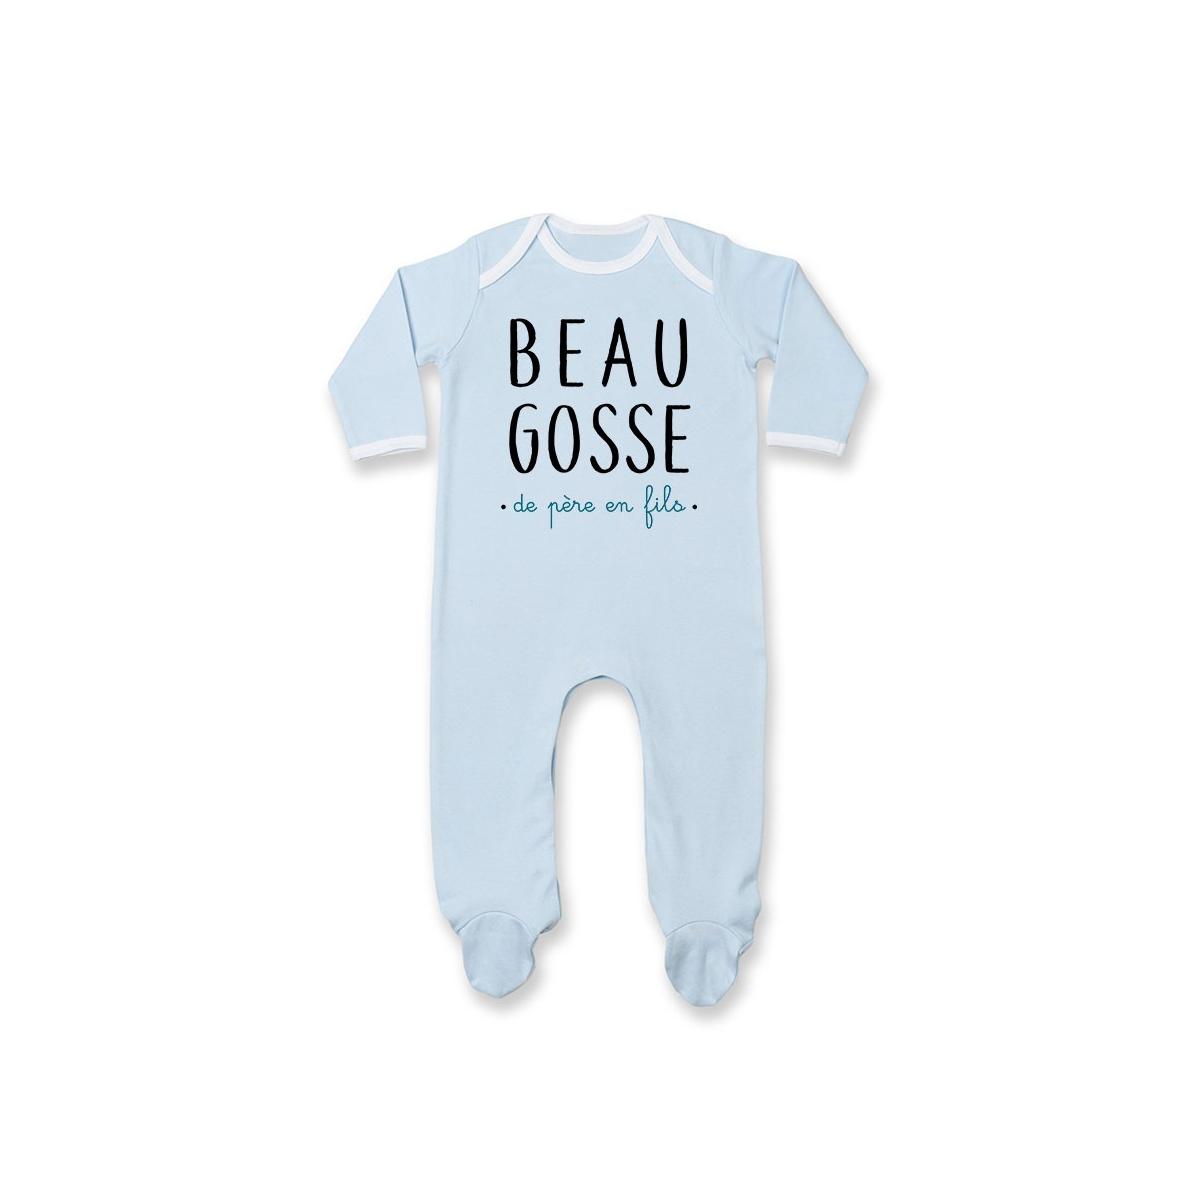 Pyjama bébé Beau gosse de père en fils